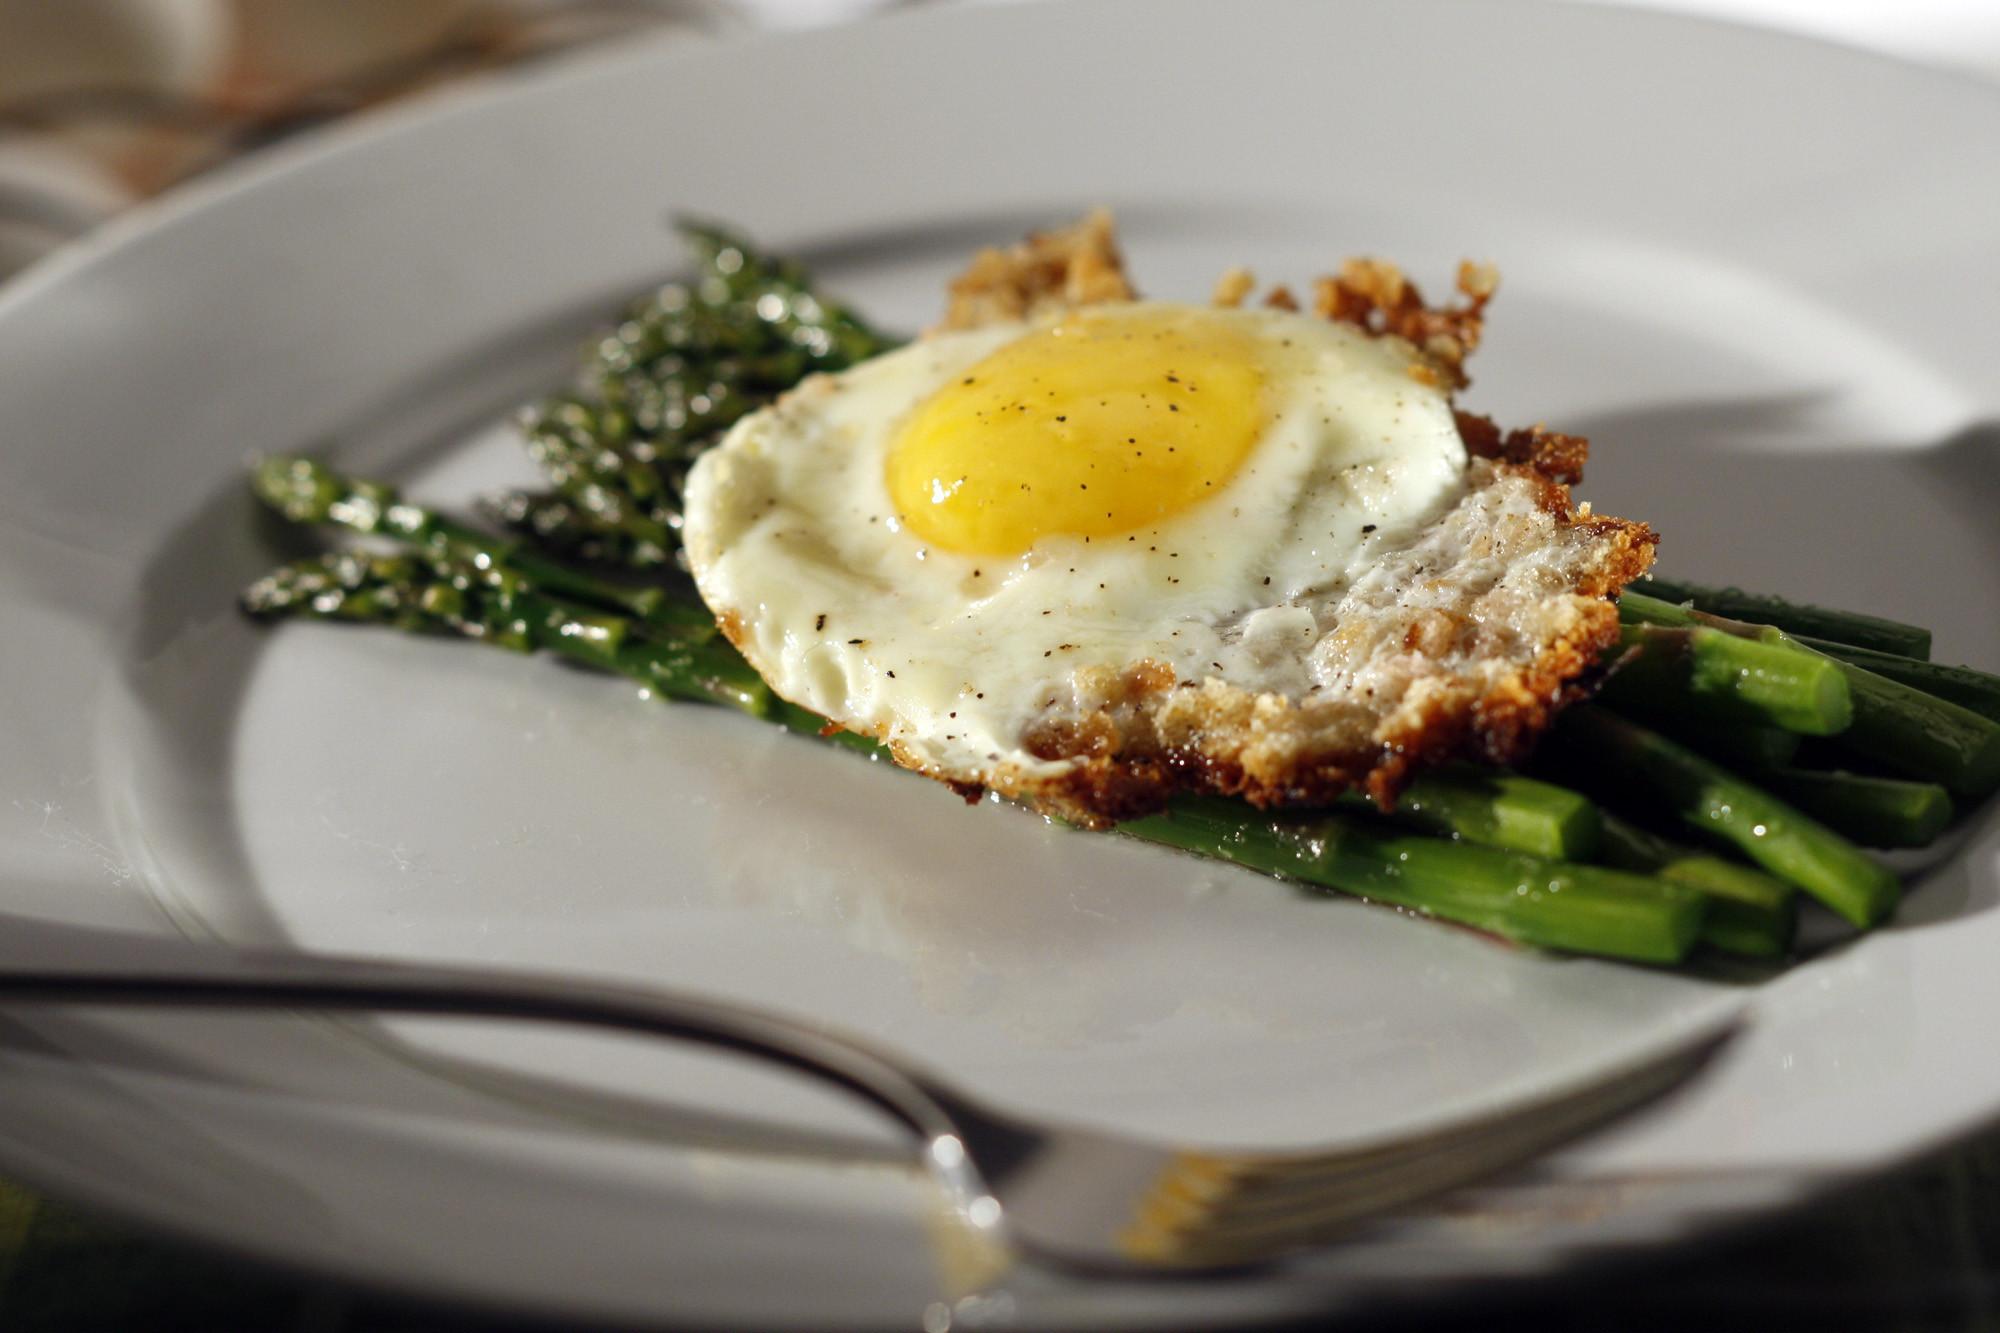 Recipe: Asparagus with bread crumb-fried eggs - California Cookbook